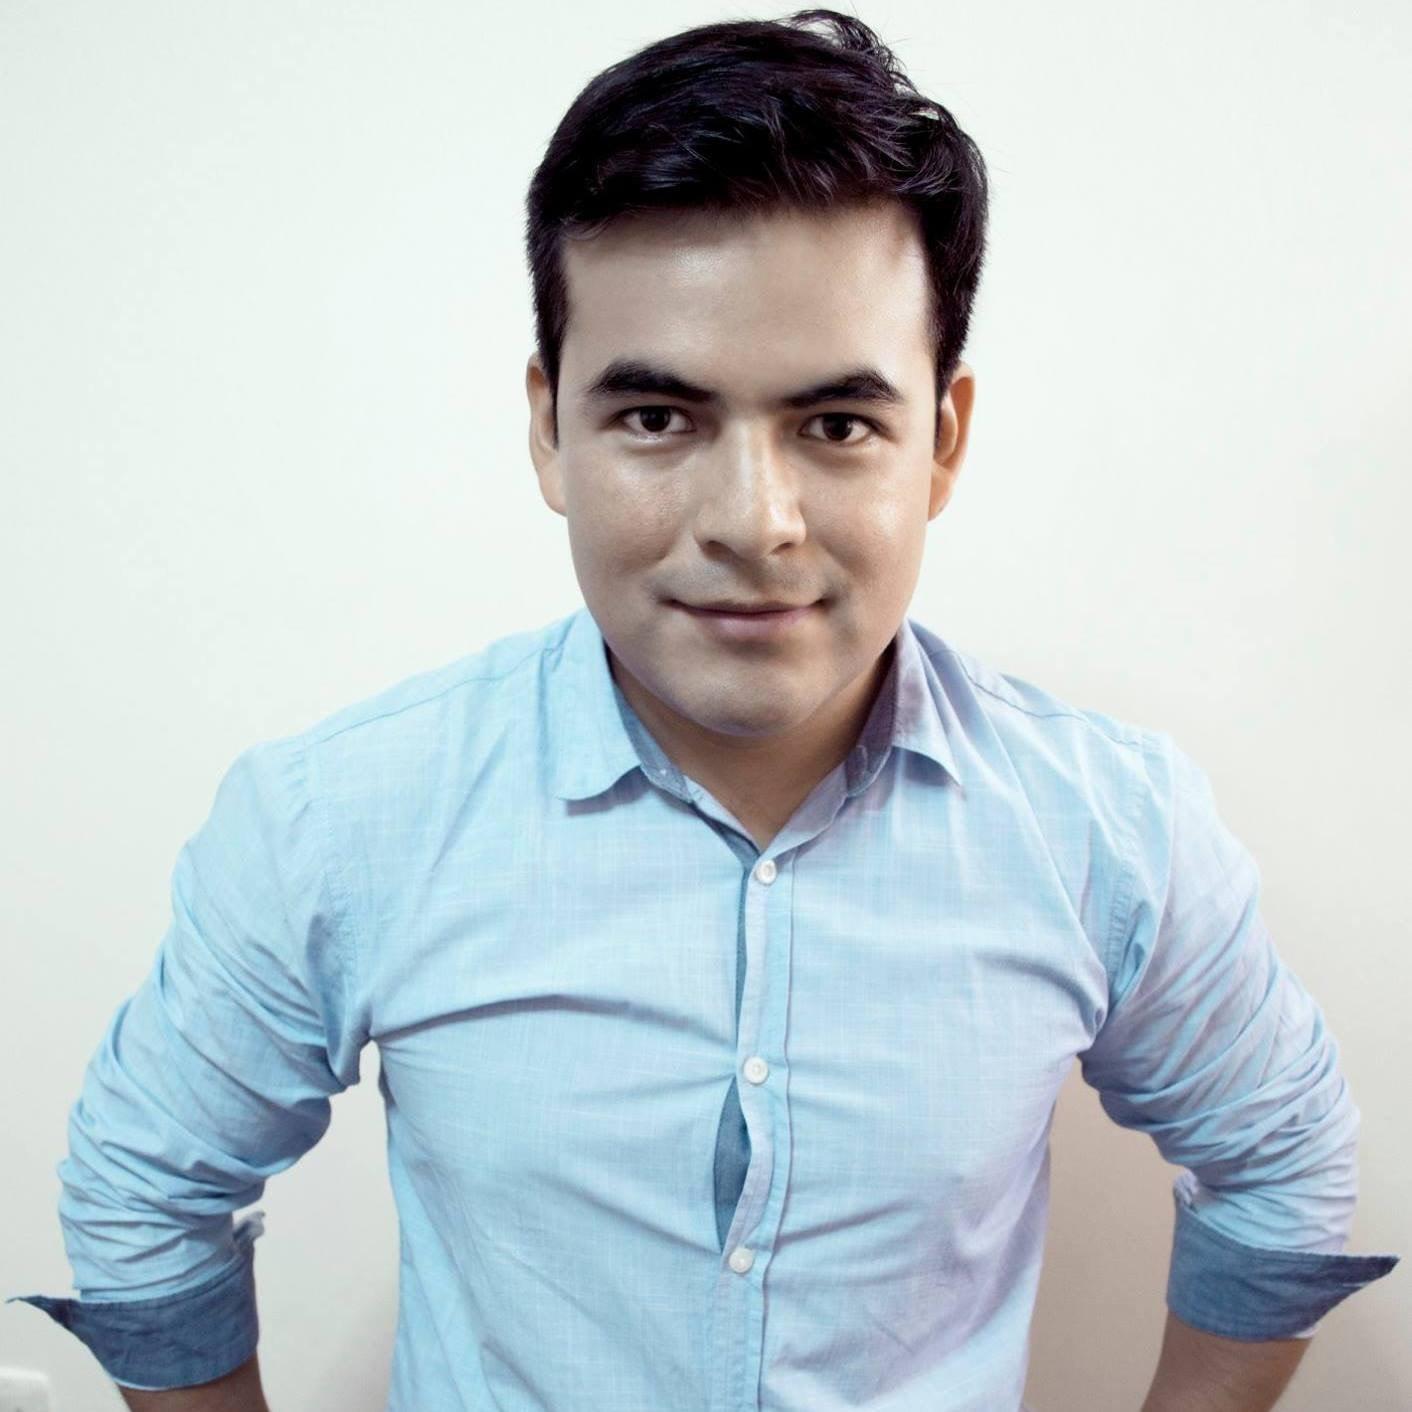 Go to David Núñez's profile